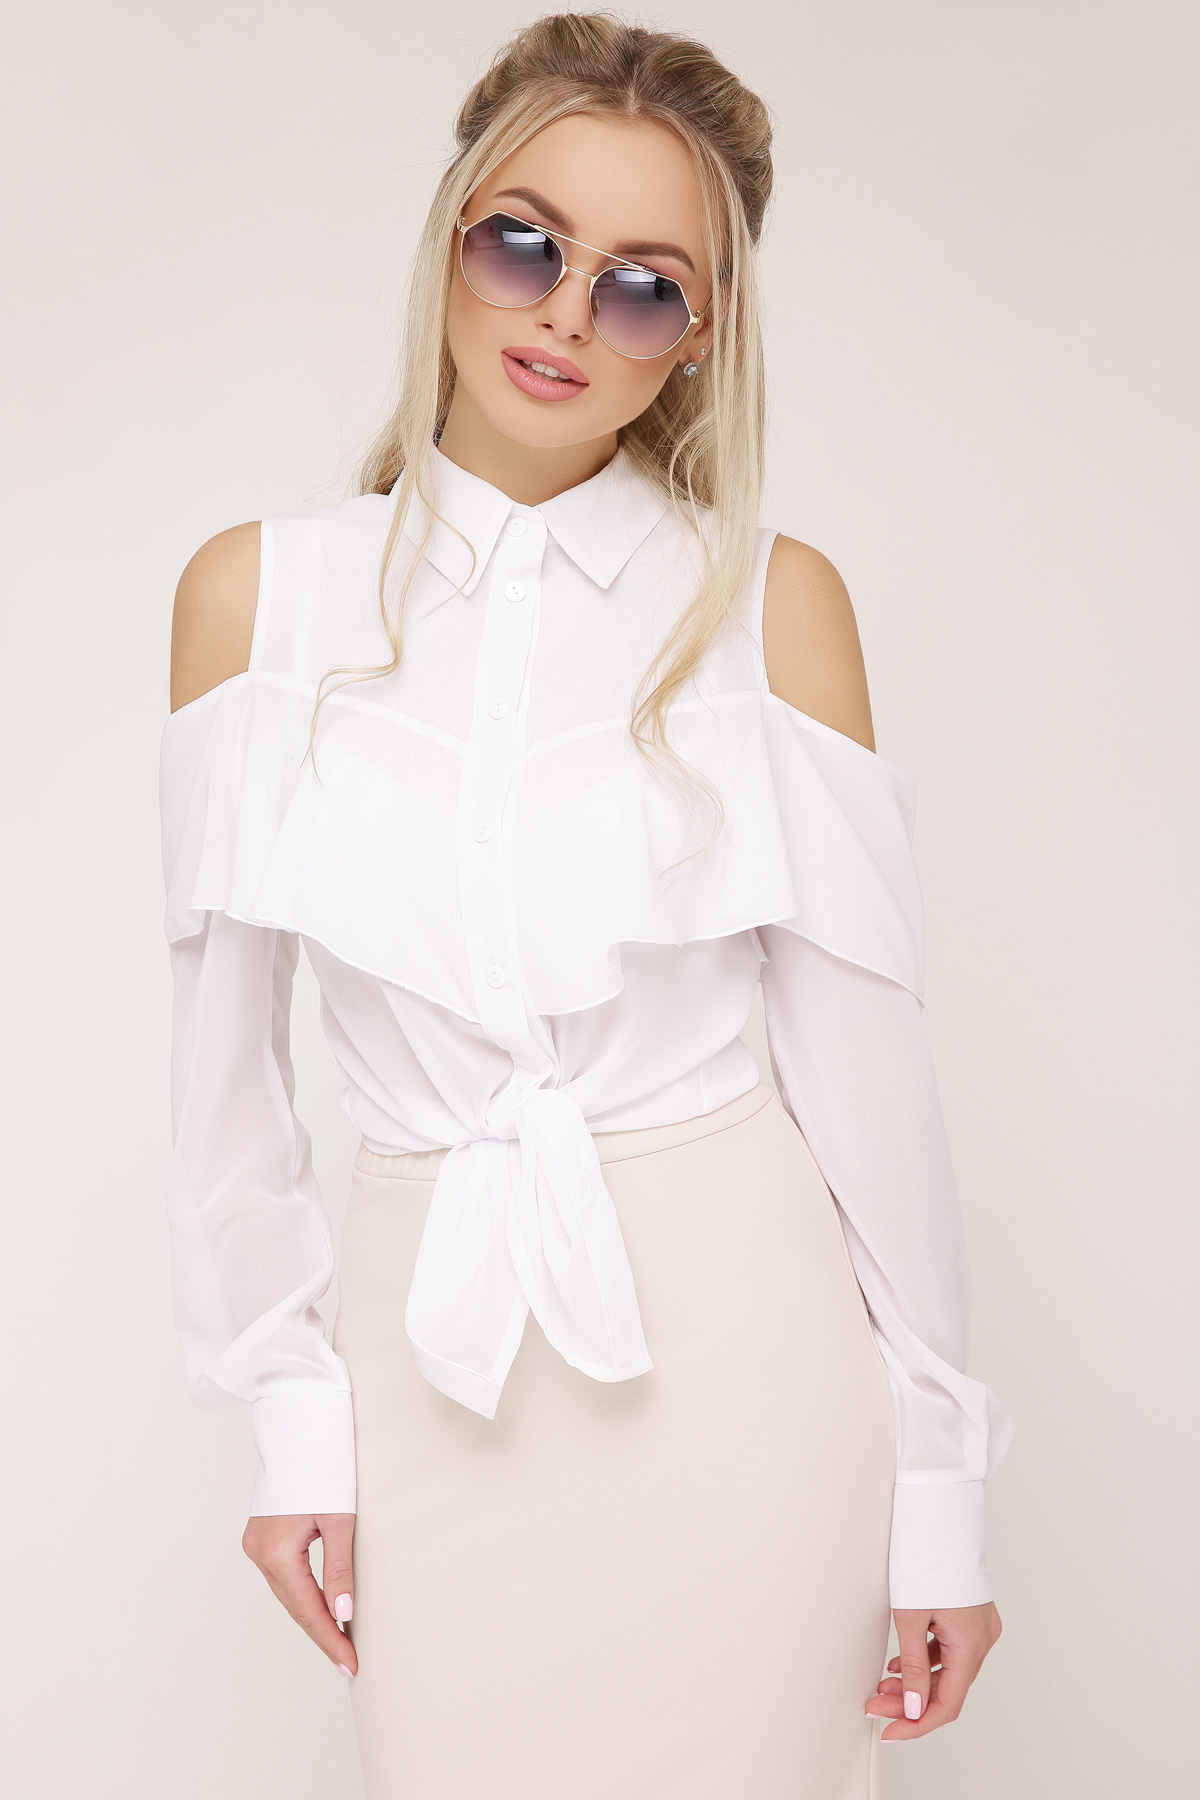 380f0c6efa6 белая шифоновая блузка. блуза Джанина д р. Цвет  белый